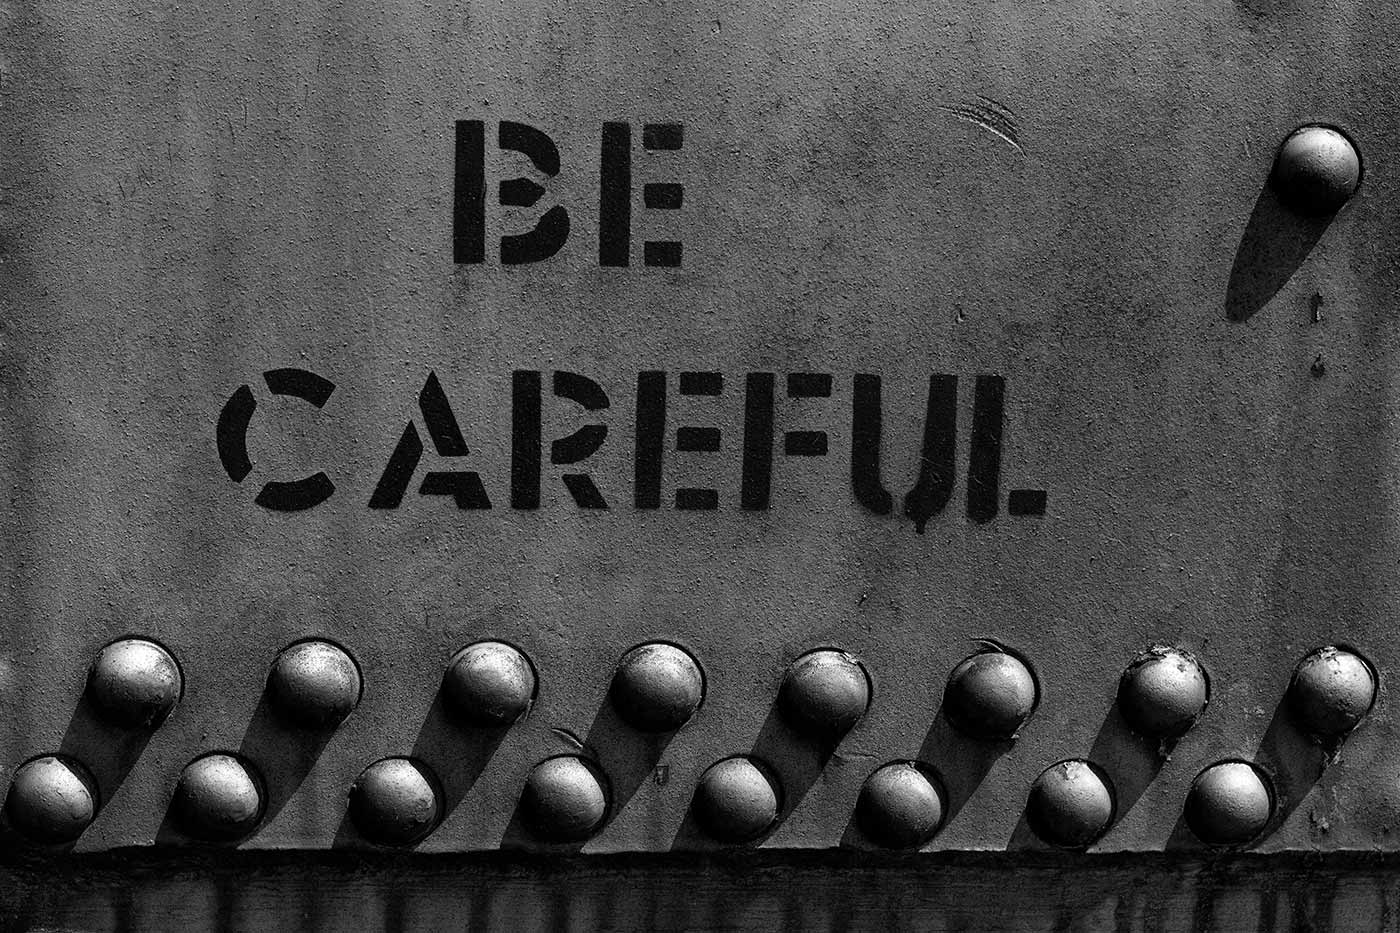 Becareful